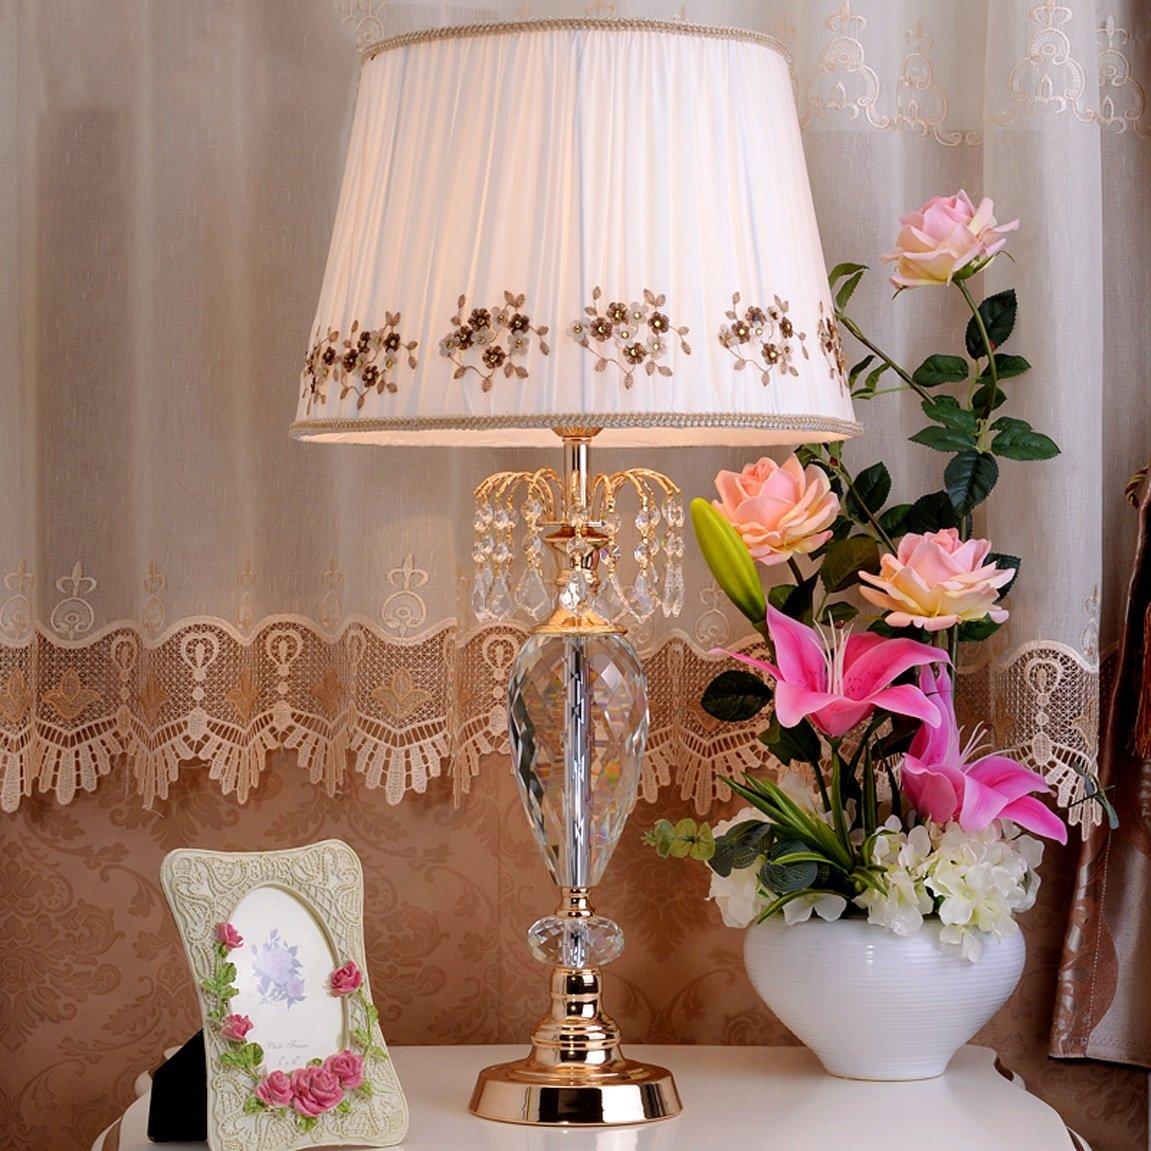 LRW クリスタルデスクランプベッドサイドベッドルームリビングルームヴィラヨーロッパテーブルランプ (Size : L42*75cm) L42*75cm  B07D3LH3KL